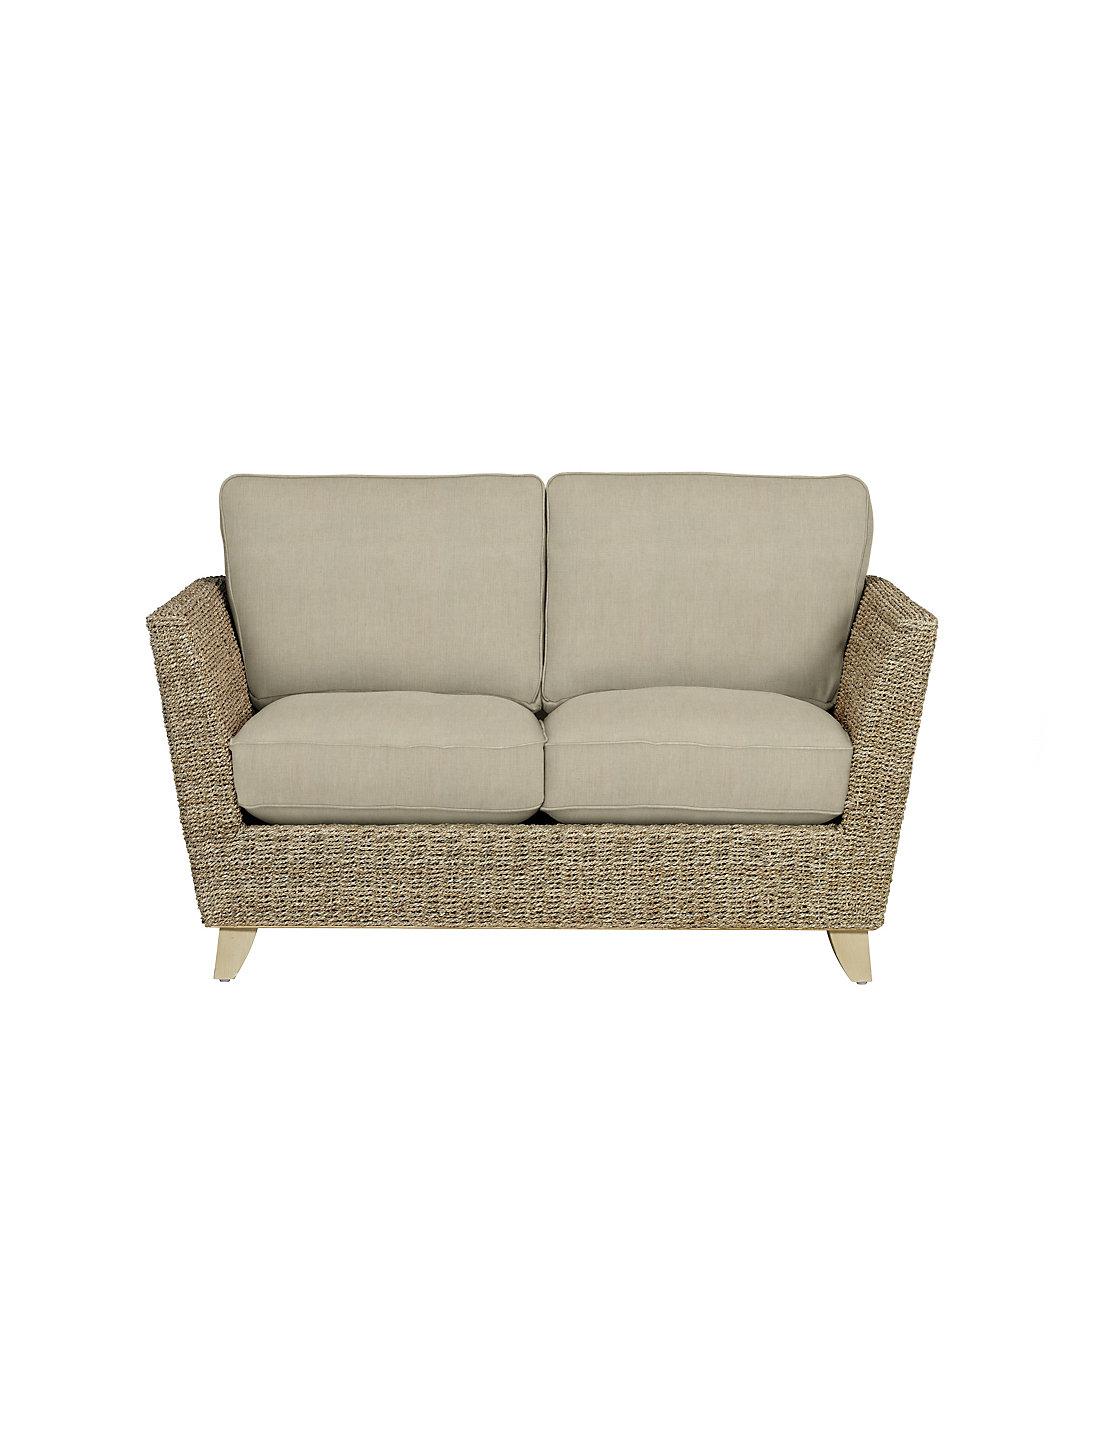 Bermuda Small Sofa. Rattan Garden Furniture   Rattan Sofas   Sun Loungers   M S